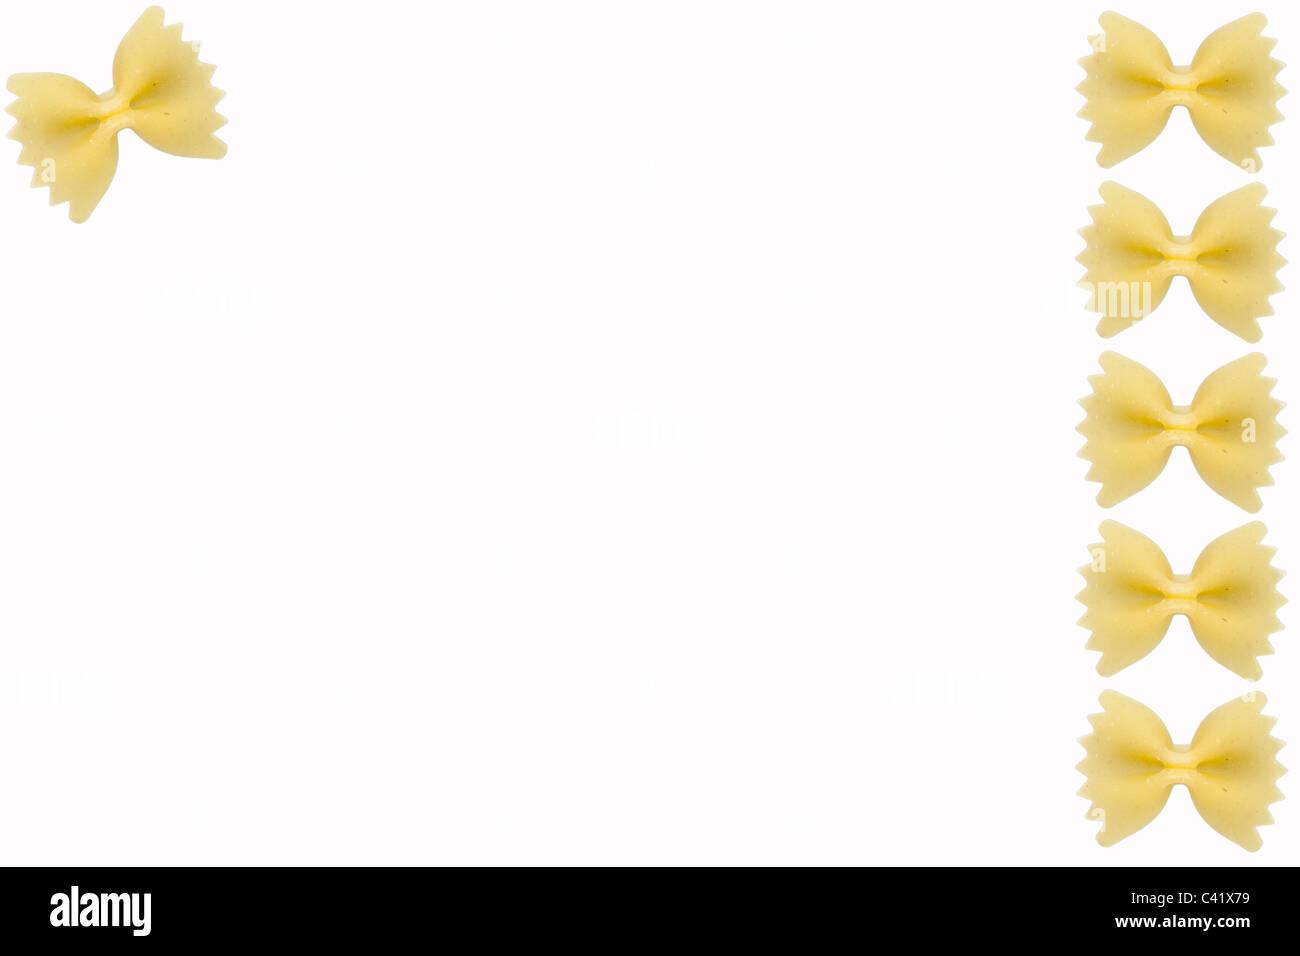 La pasta cruda sobre fondo blanco. Imagen De Stock